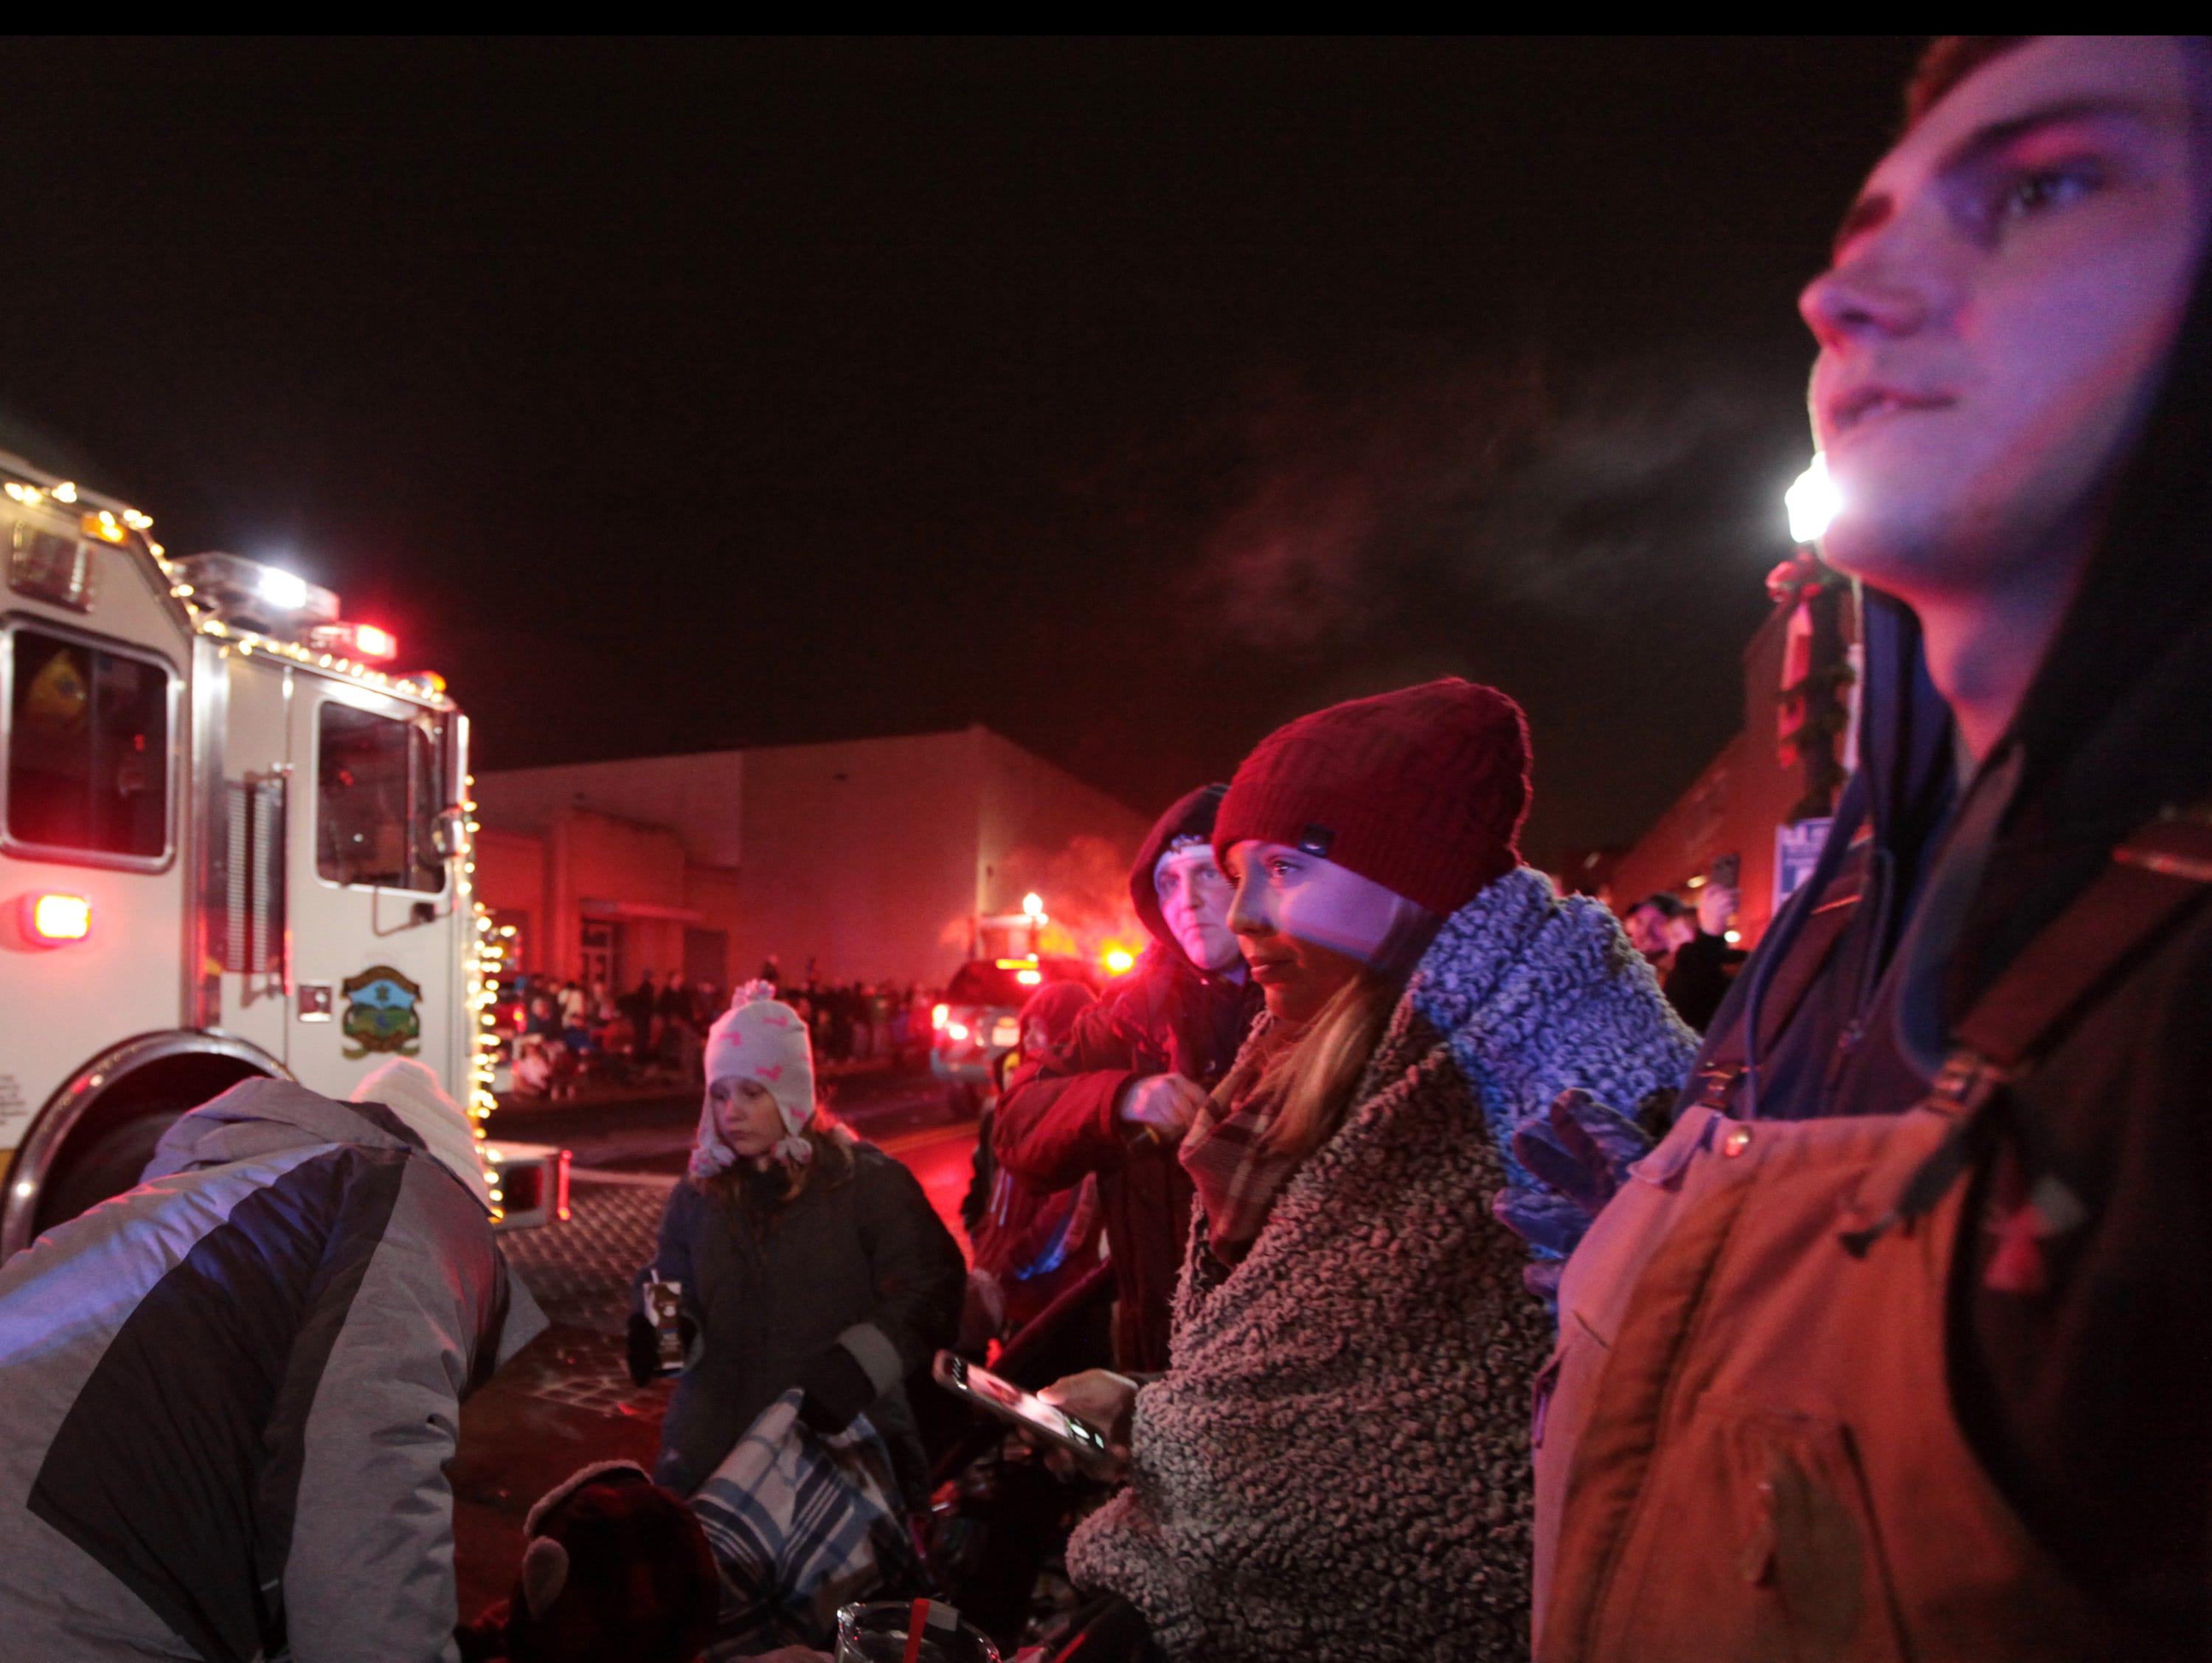 Patrons watch the annual Waynesboro Christmas parade travel up W. Main Street on Saturday, Dec. 1, 2018.